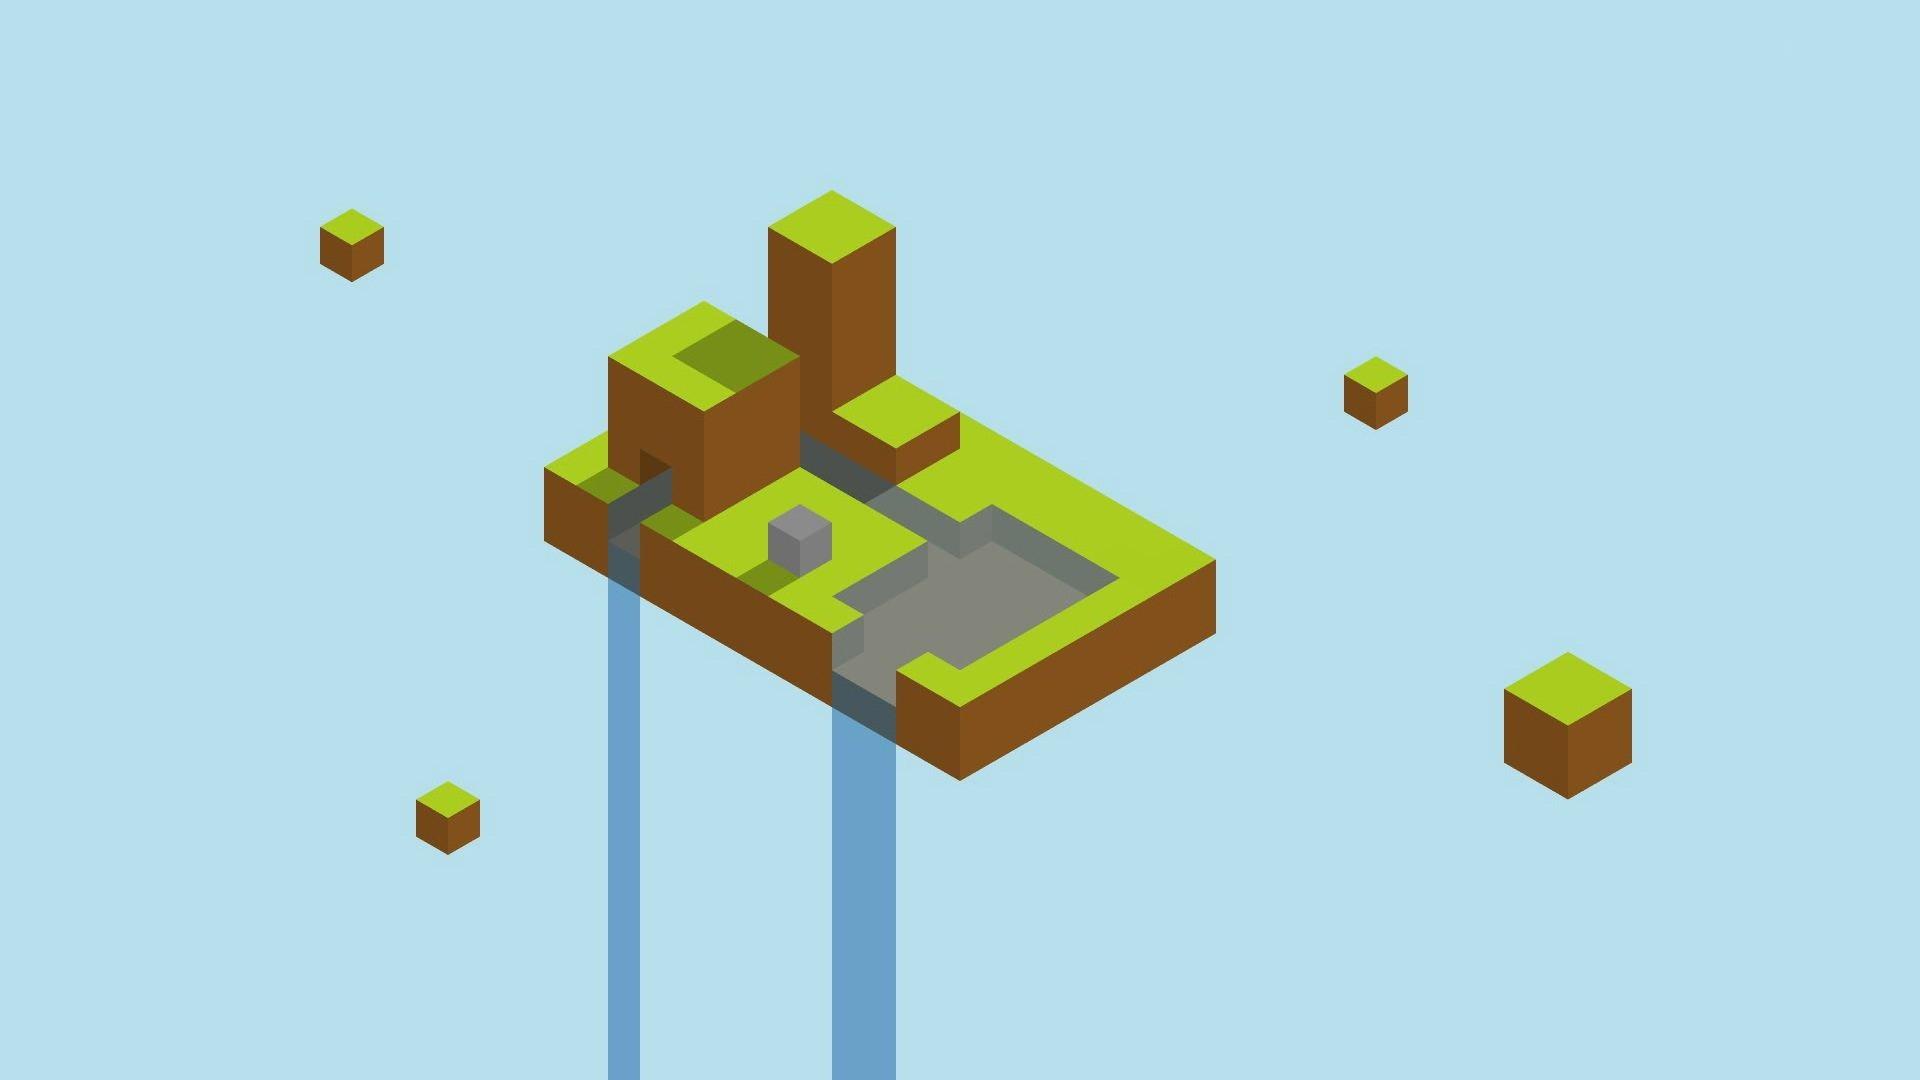 Minecraft Minimalist Image